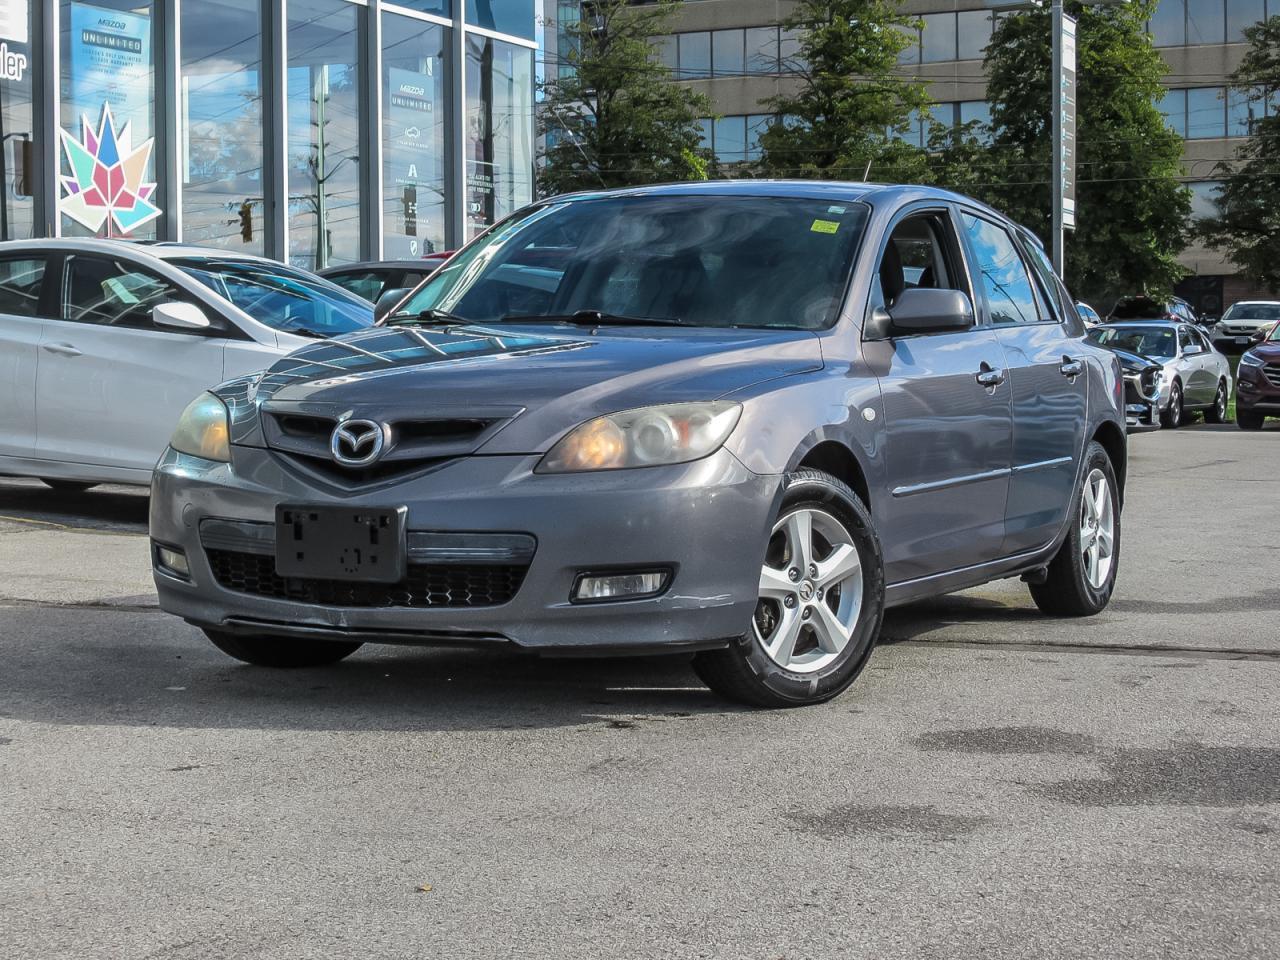 2008 Mazda MAZDA3 AUTOMATIC HATCHBACK/WINTER TIRES